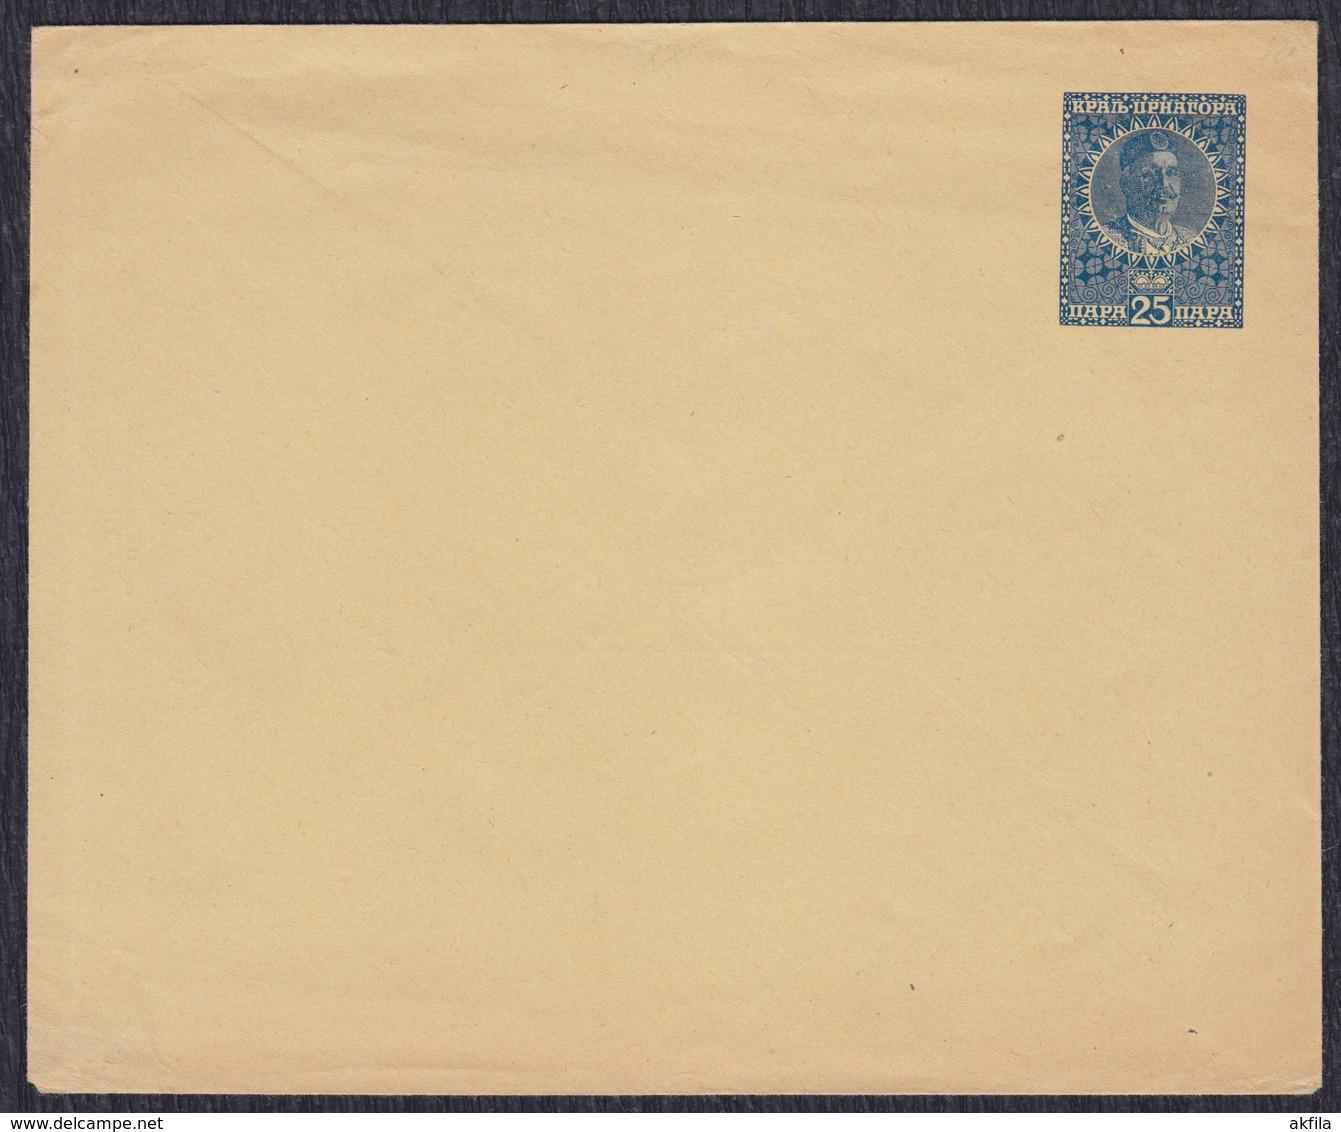 Kingdom Of Montenegro 1913 Value 25 Para, King Nikola I Petrovic, Postal Stationery - Montenegro